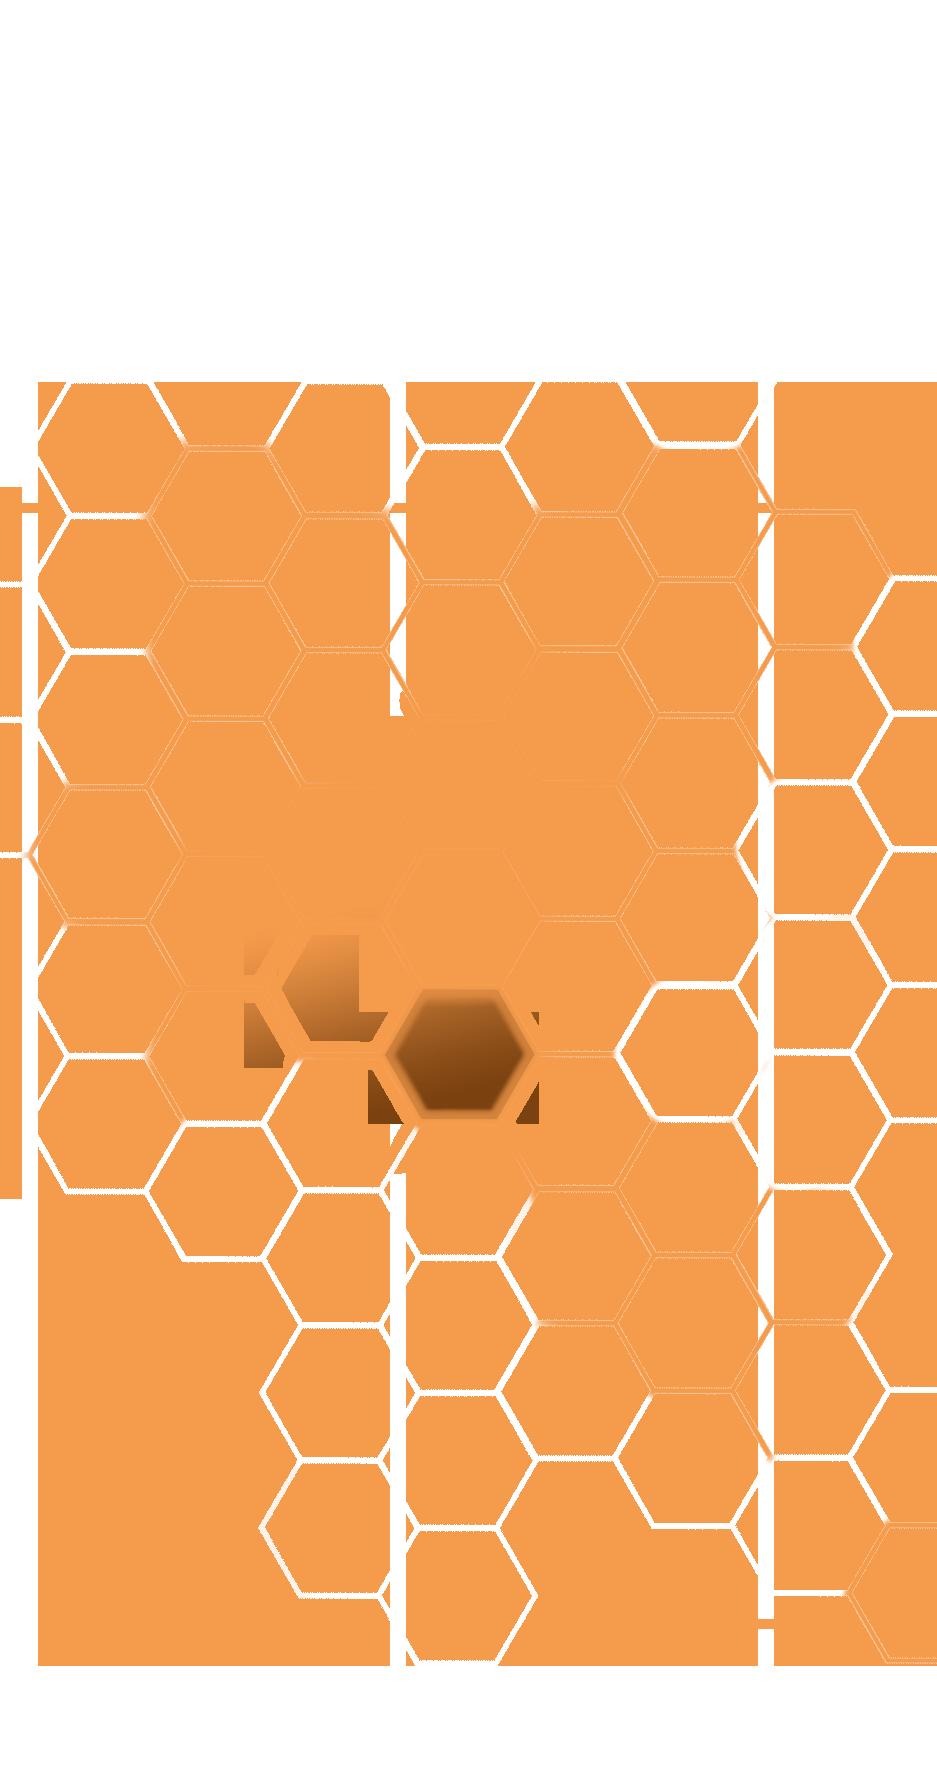 Honeycomb In 2020 Honeycomb Pattern Honeycomb Pattern